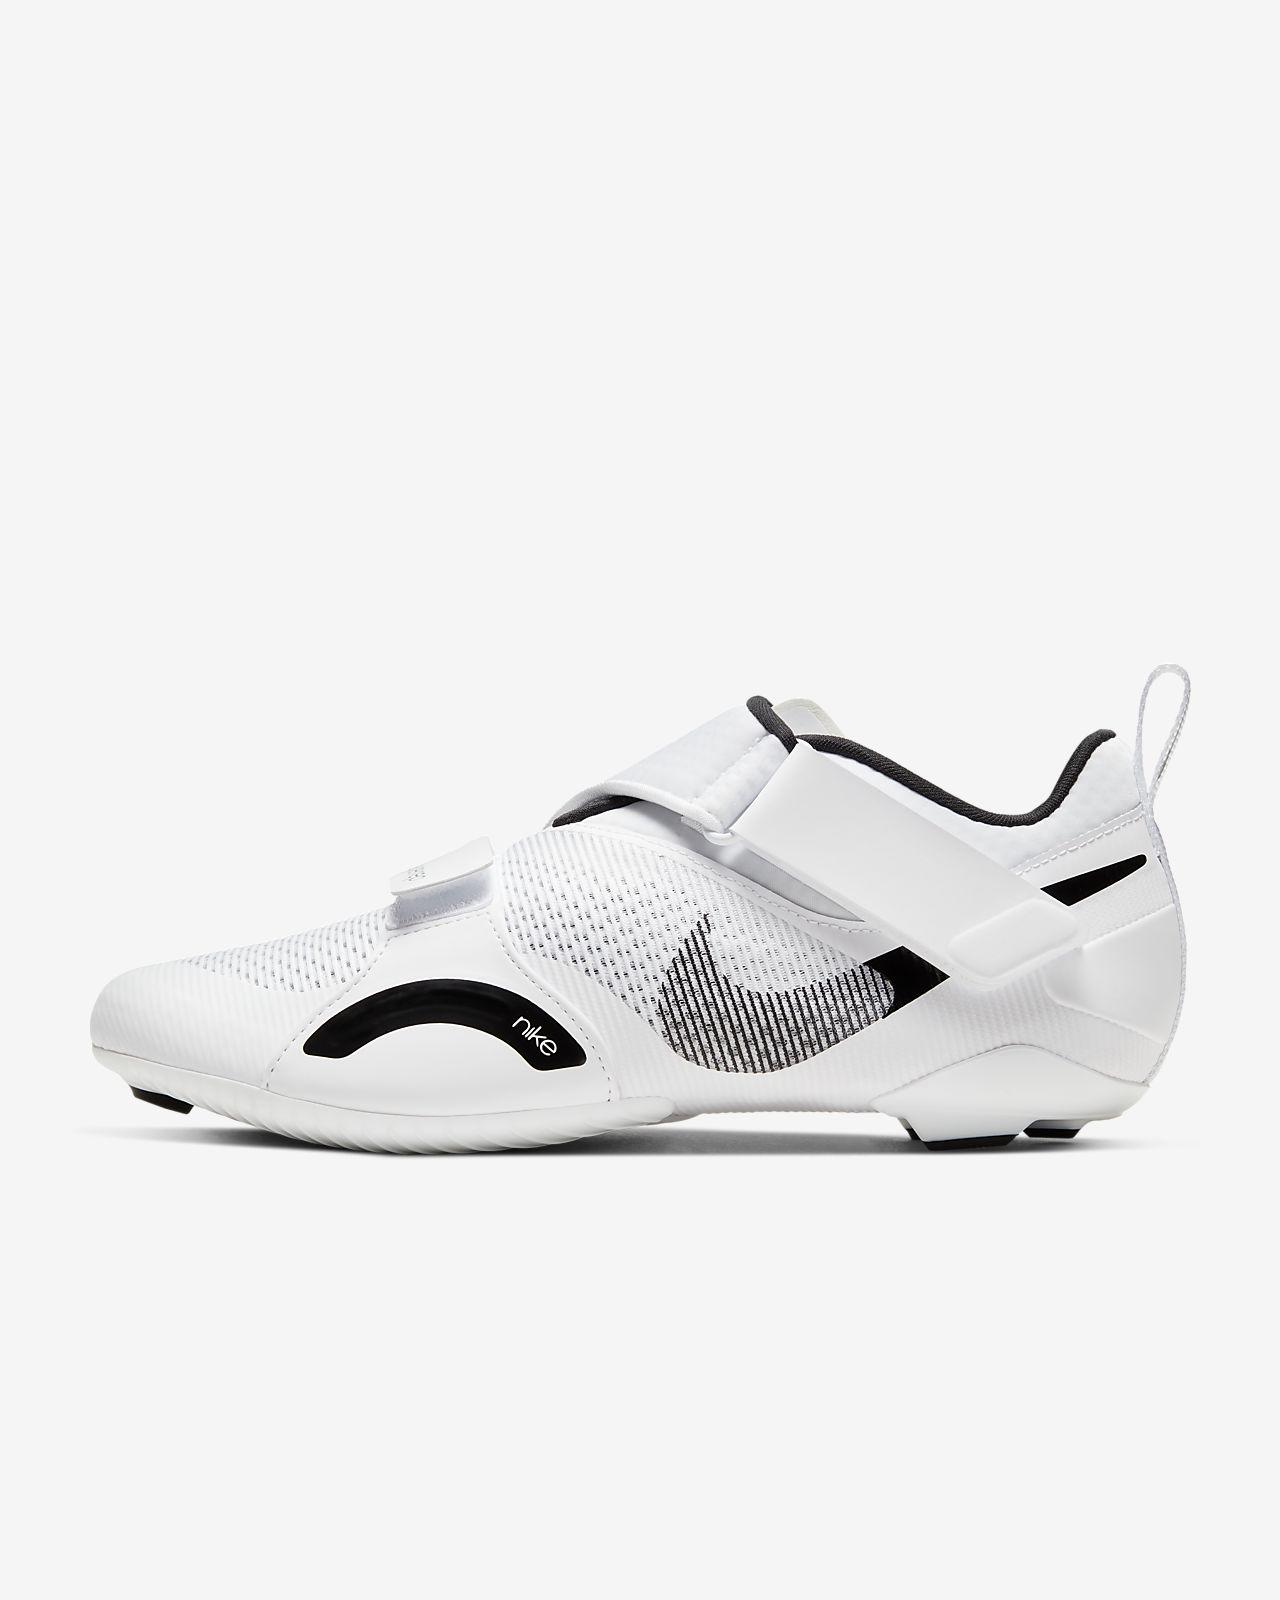 Soccer shoes for men in 2020 | Nike men, Nike, Shoes mens